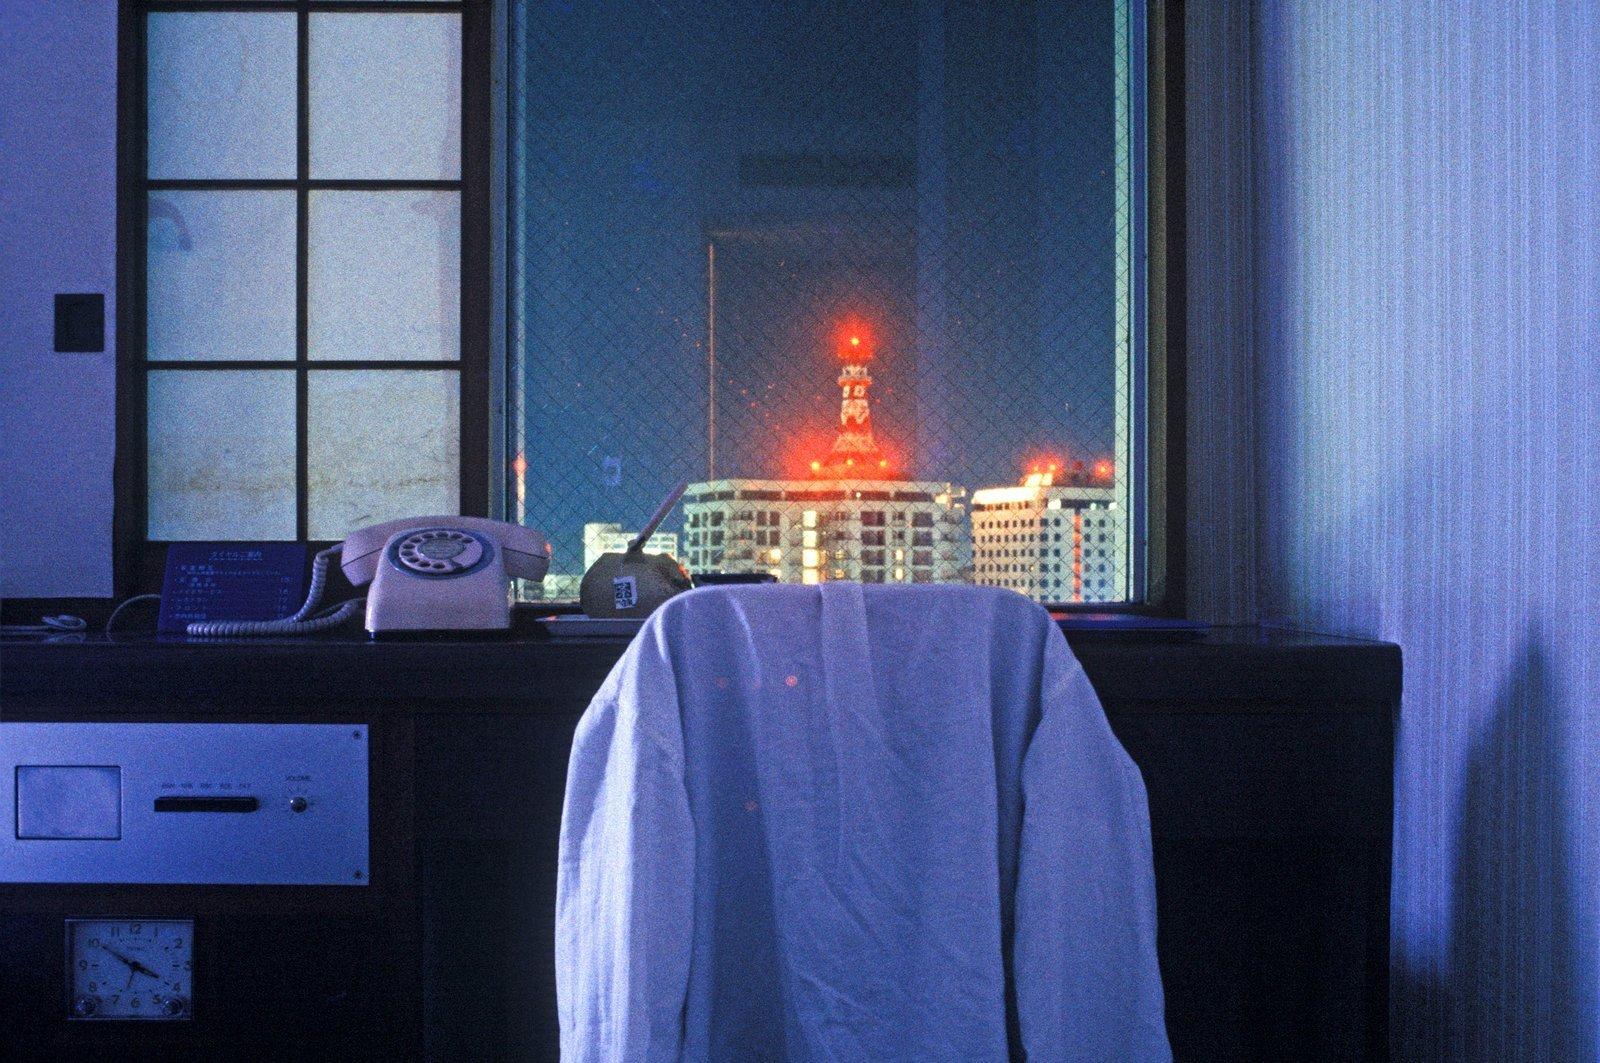 3:50am, Hotel Room, Okinawa